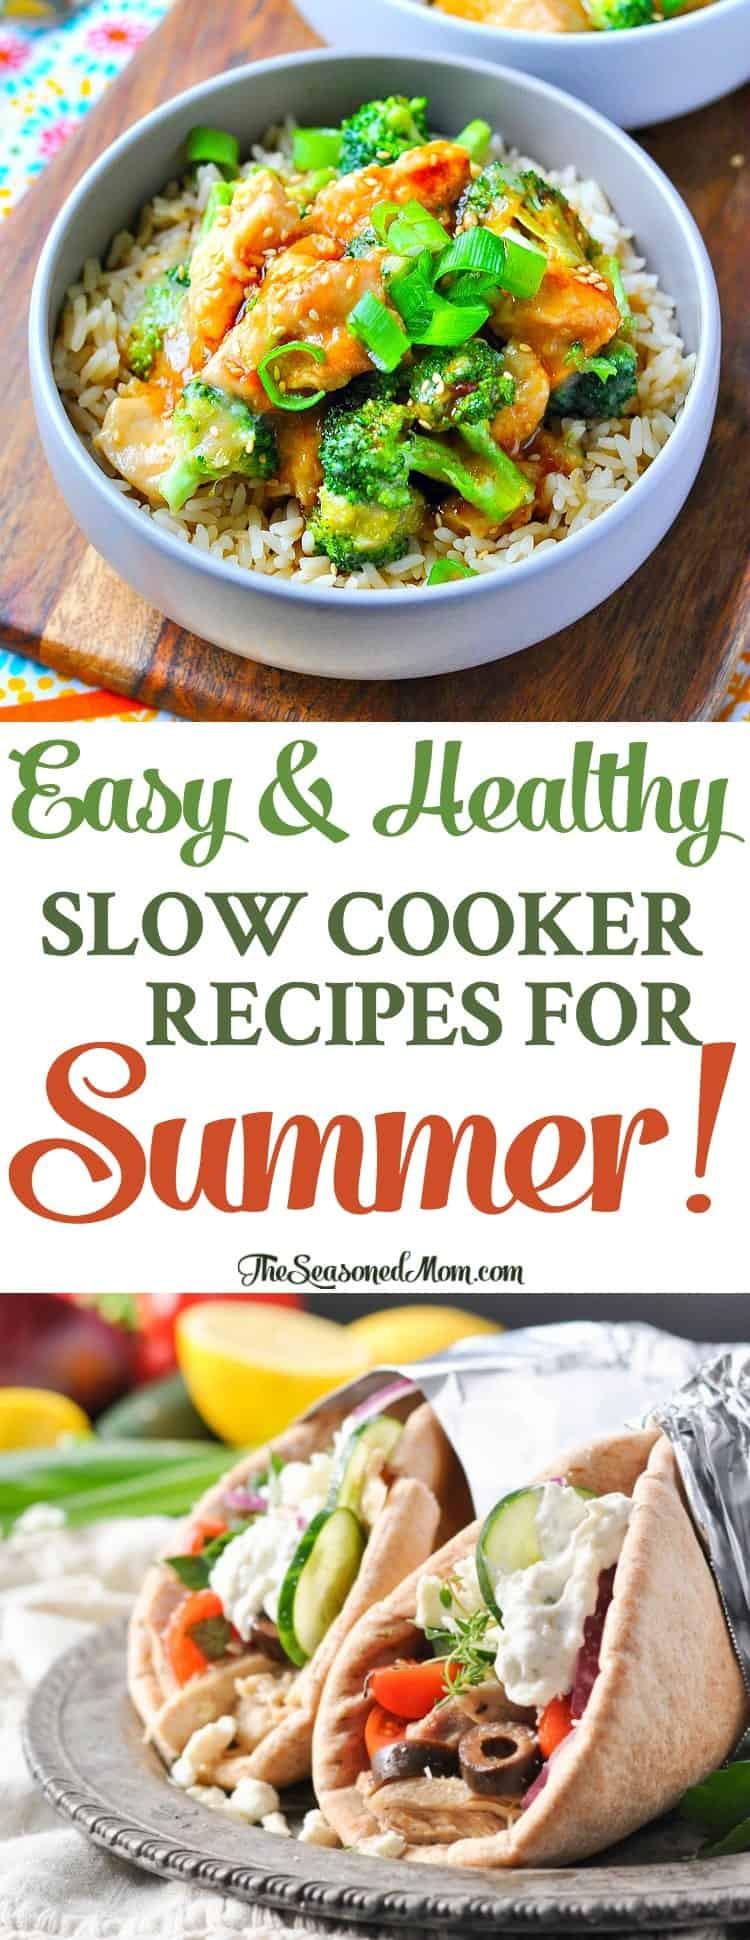 Healthy Easy Slow Cooker Recipes  Easy Healthy Slow Cooker Recipes for Summer The